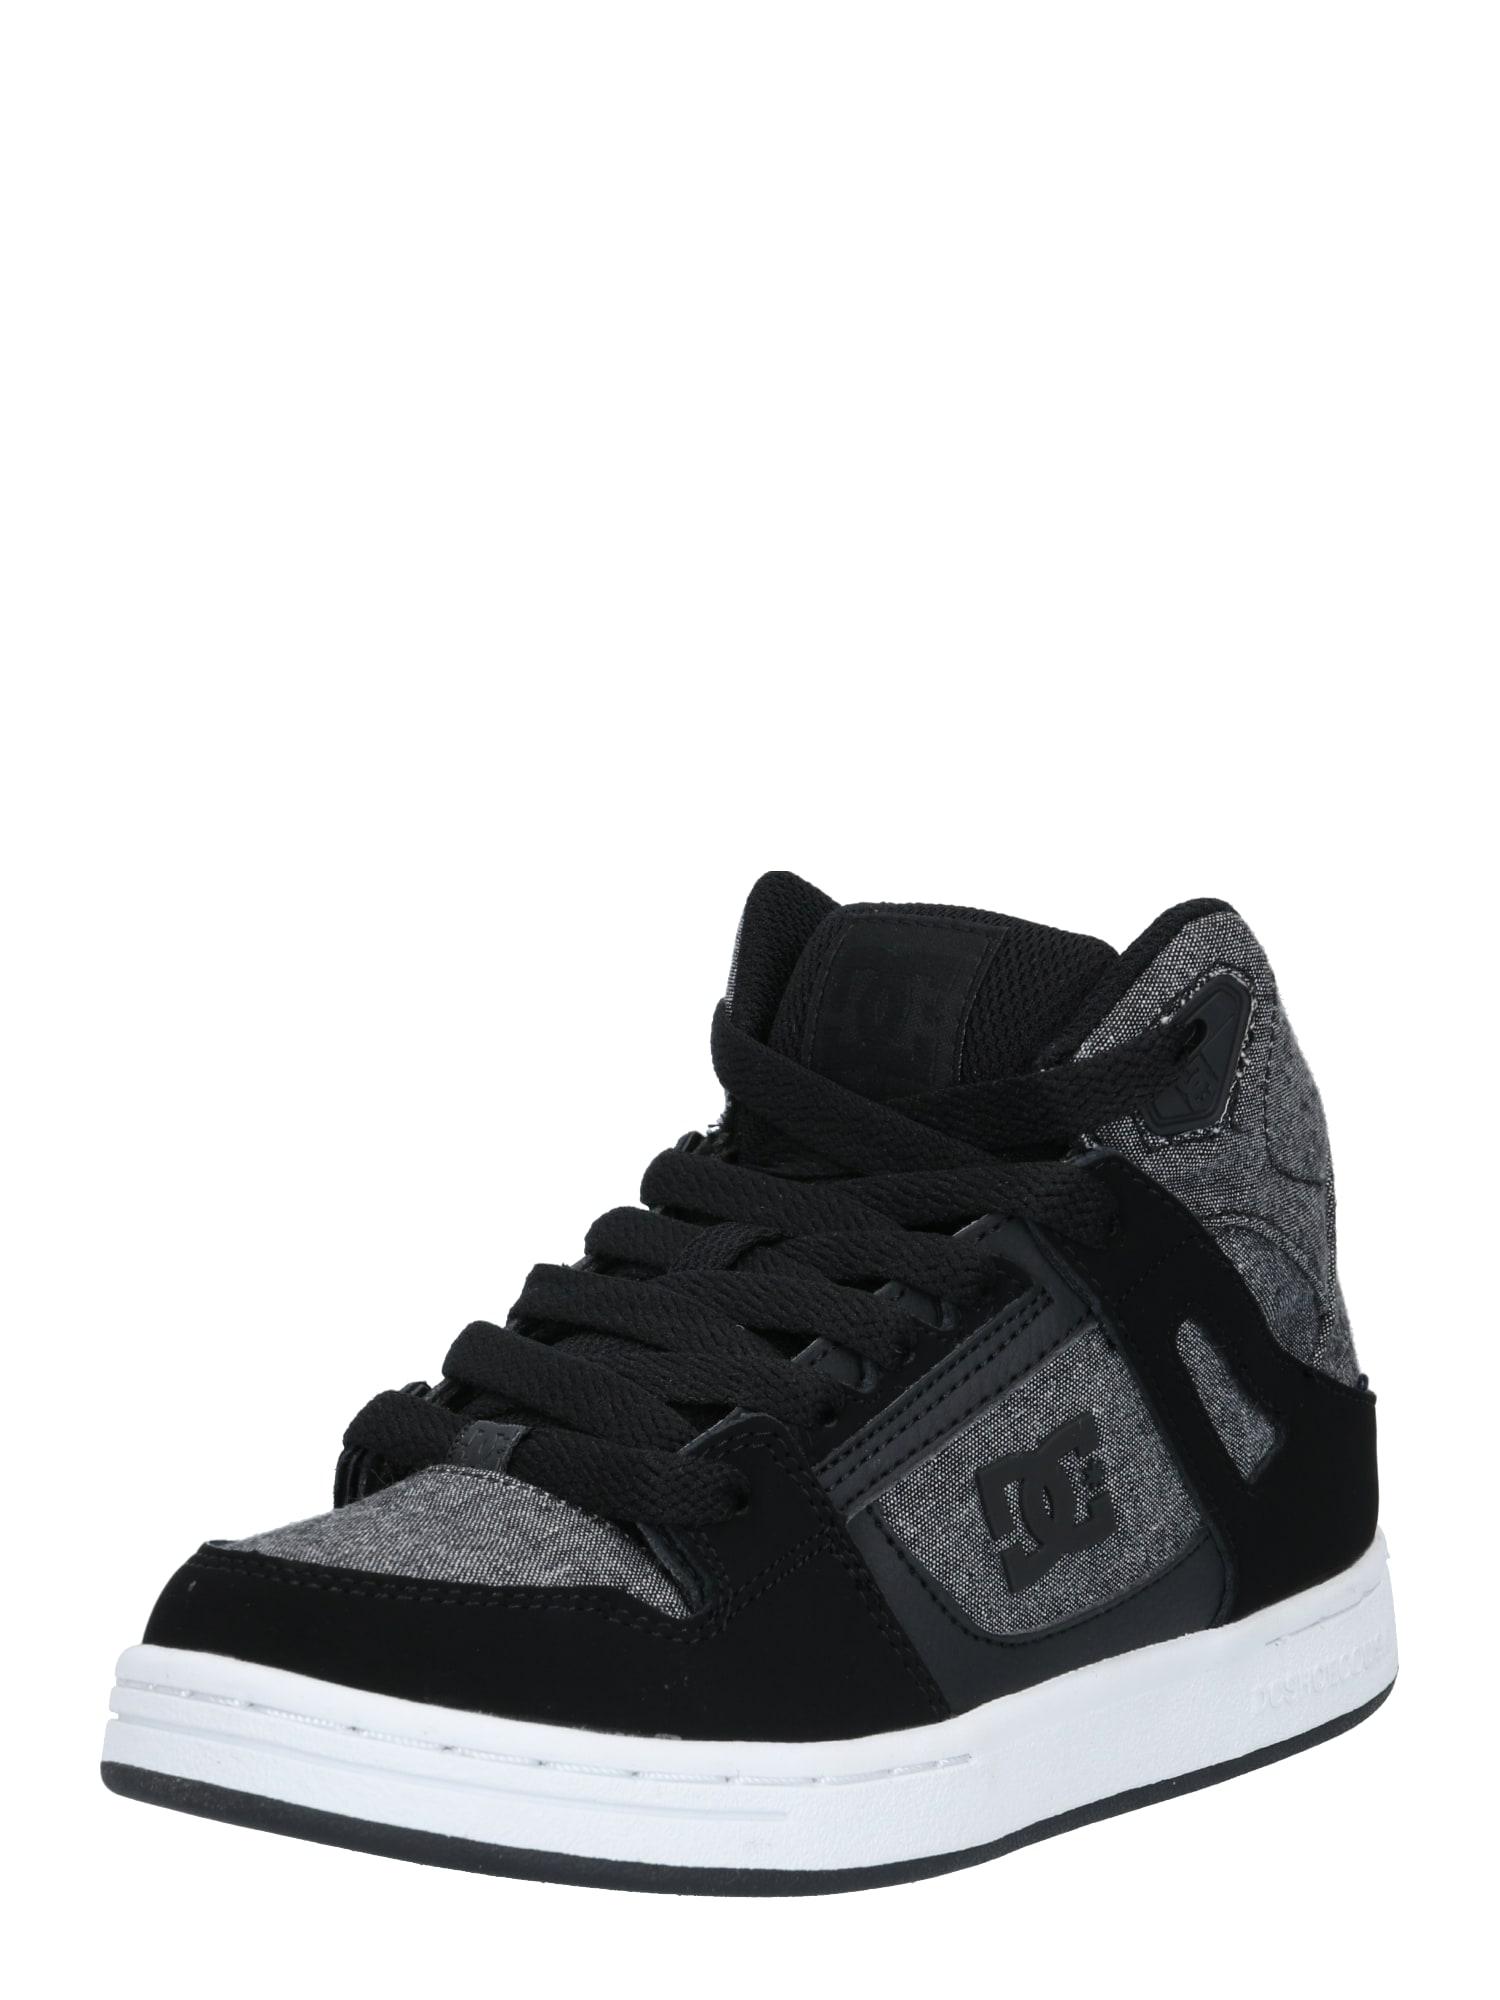 DC Shoes Sportiniai batai pilka / juoda / tamsiai pilka / balta